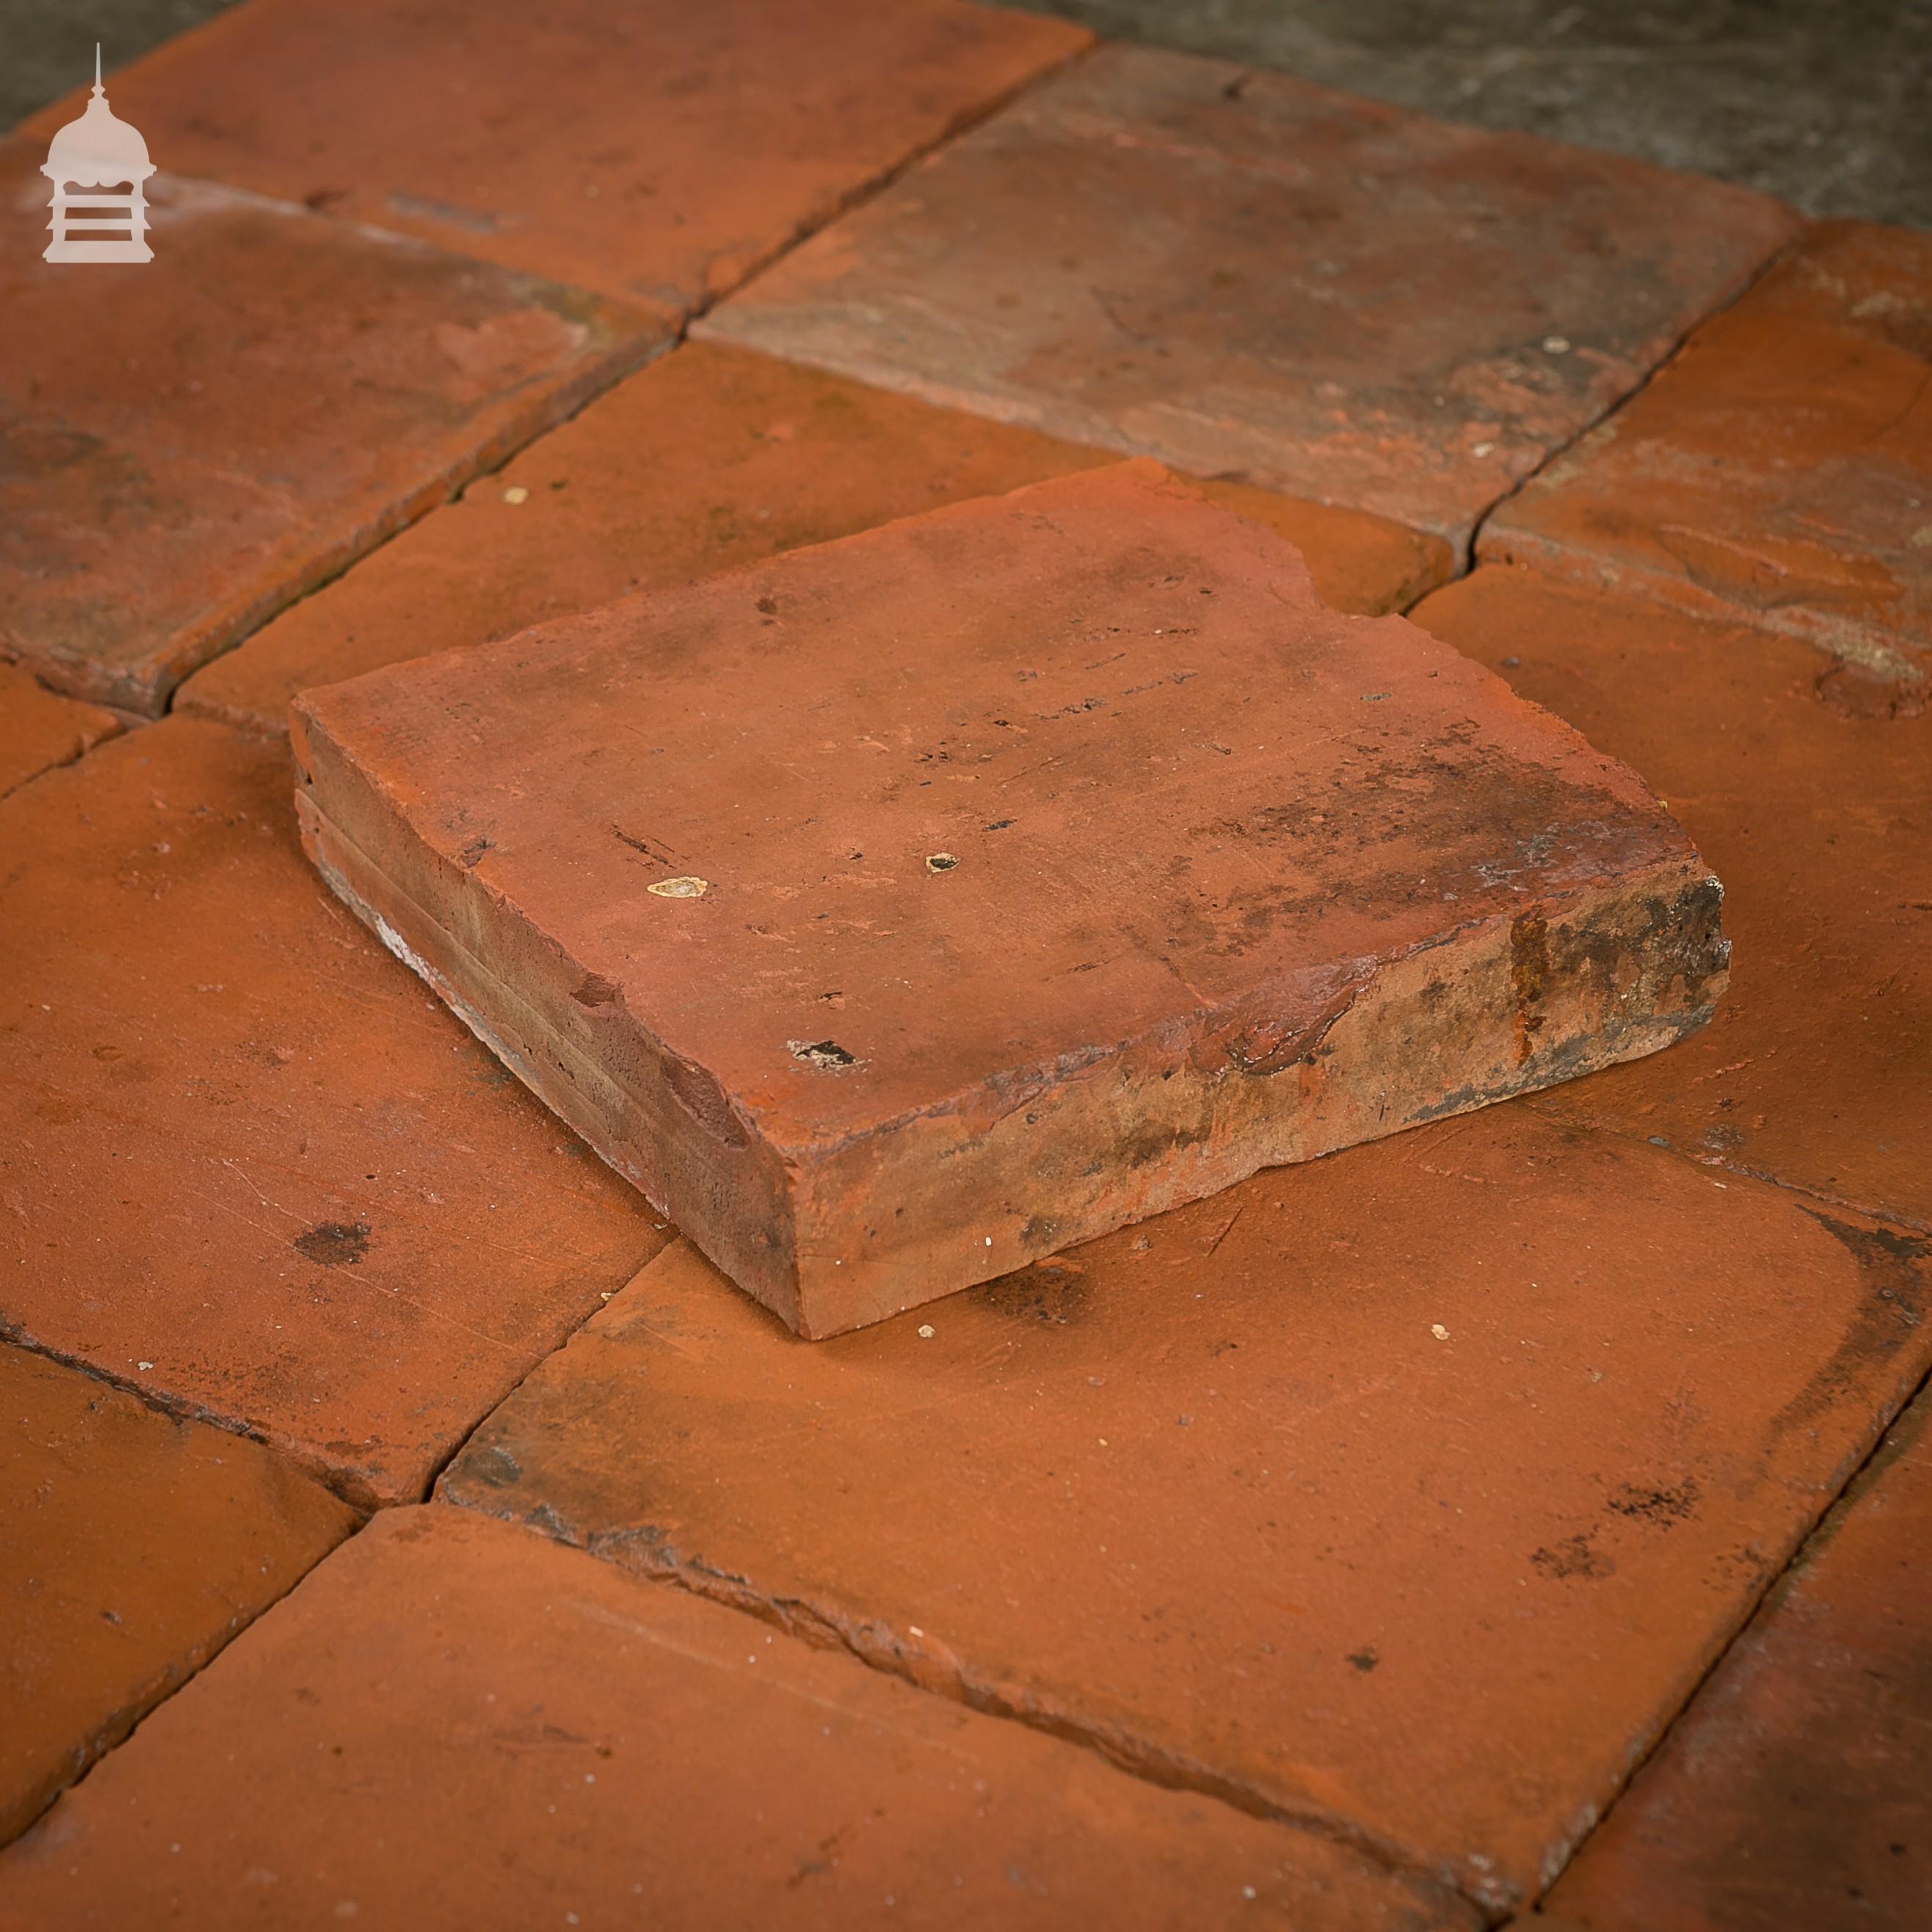 Reclaimed 9 Inch X 9 Inch Red Quarry Tiles 9x9 Floor Tiles